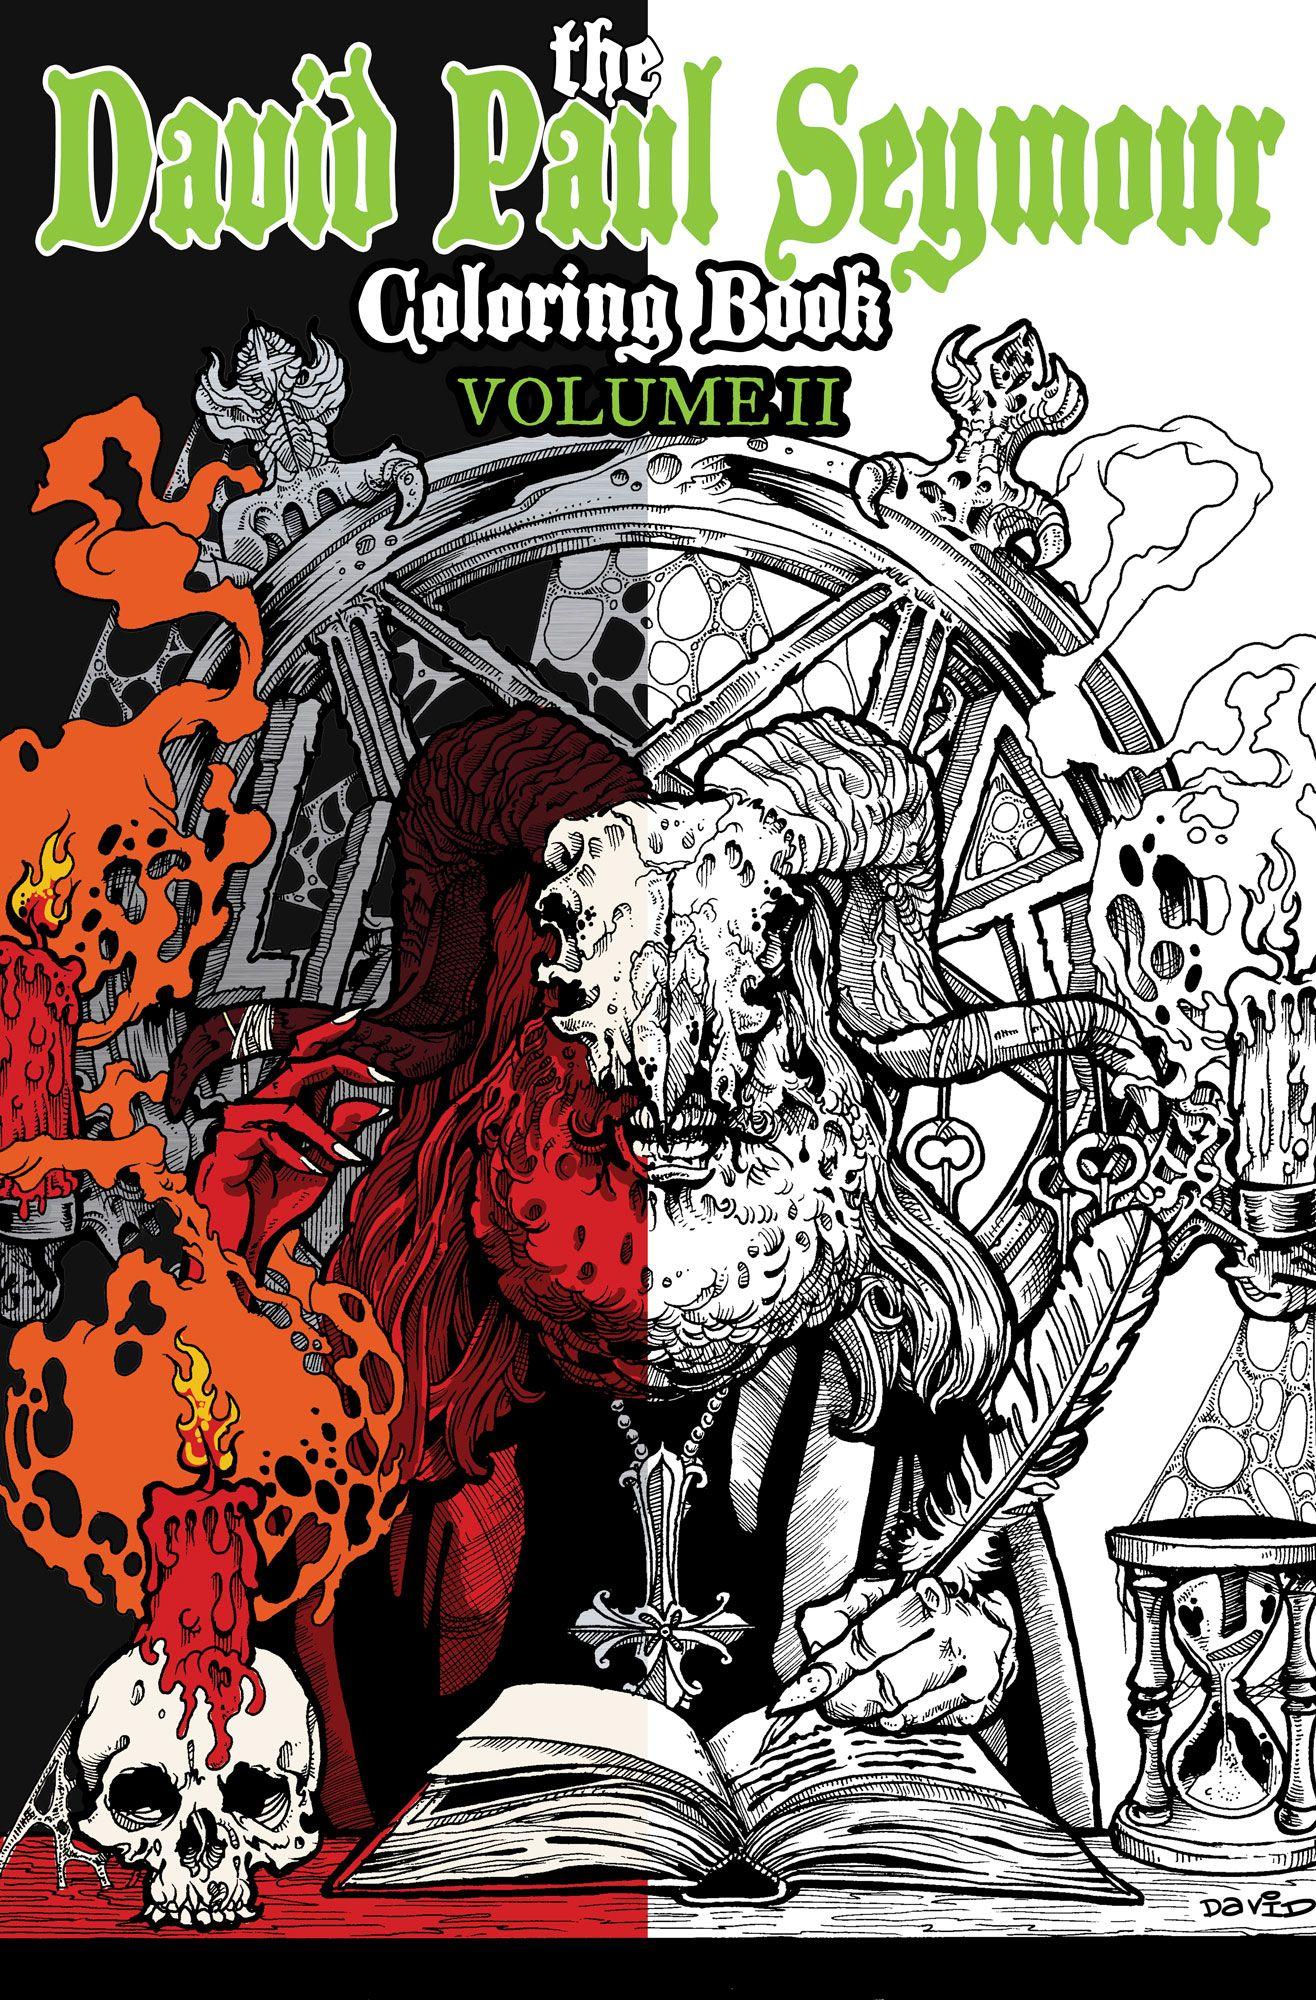 David Paul Seymour Heavy Metal Adult Coloring Book, VOLUME II from ...